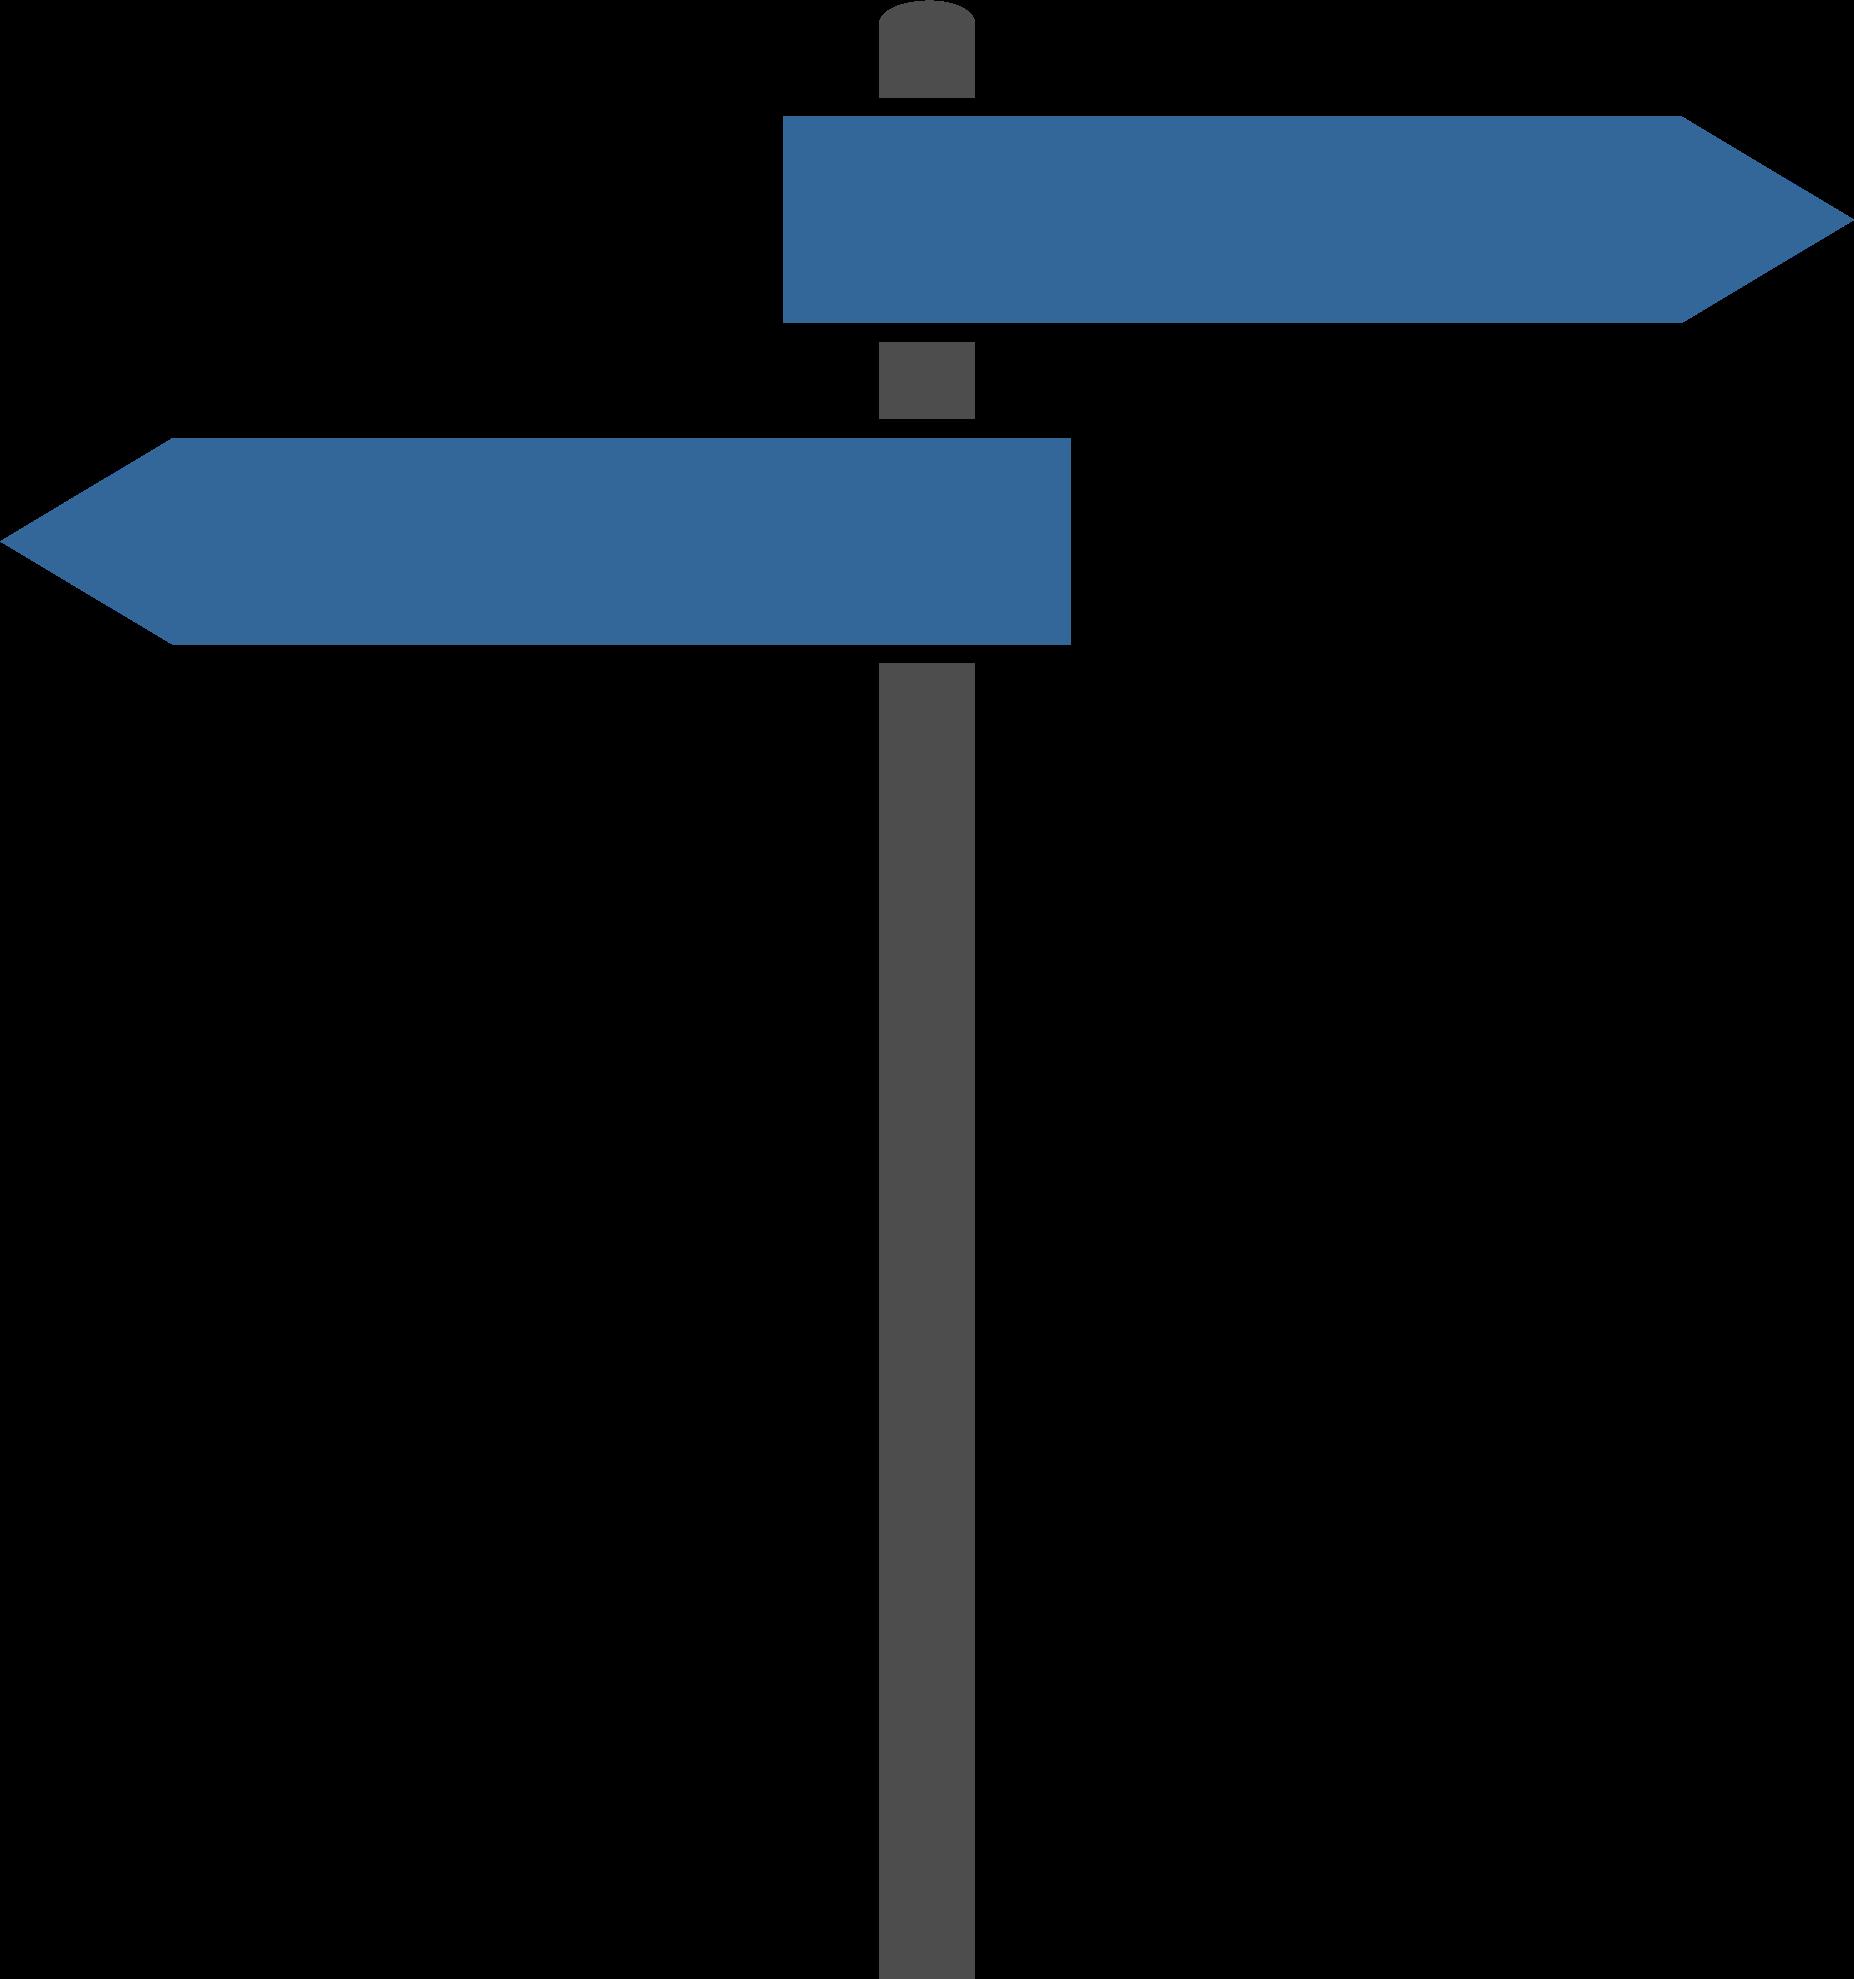 BIG IMAGE (PNG) - PNG Signpost